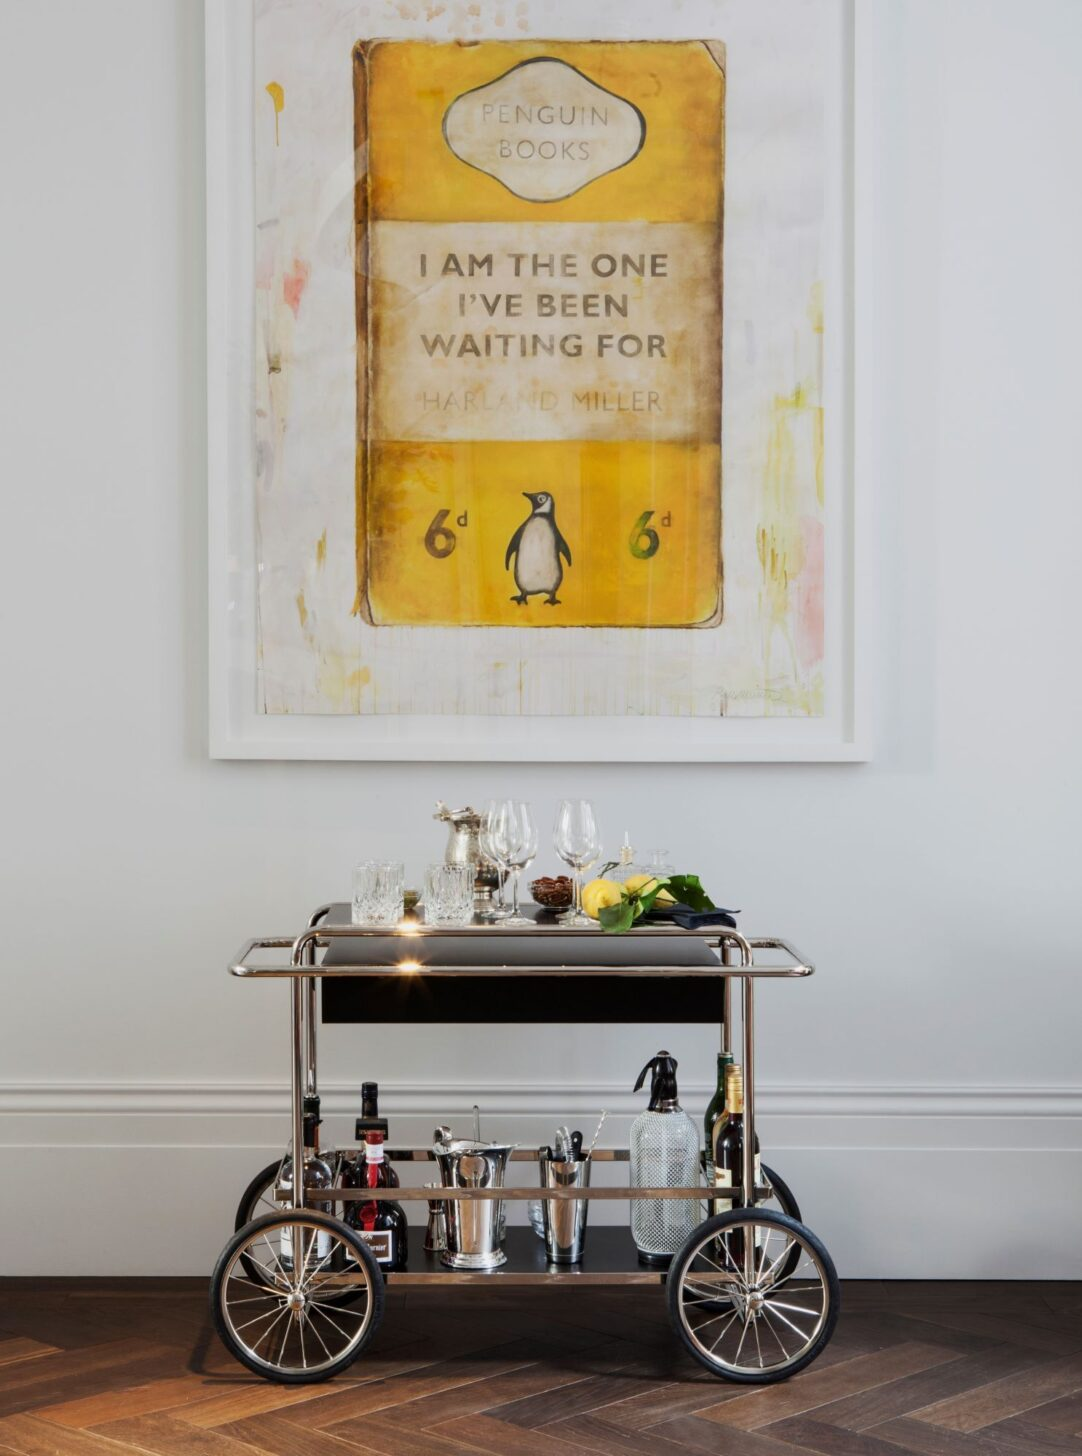 Oak landmark montacute in Laslett Hotel Henderson Bar library with penguin books poster photo by Ana Cuba